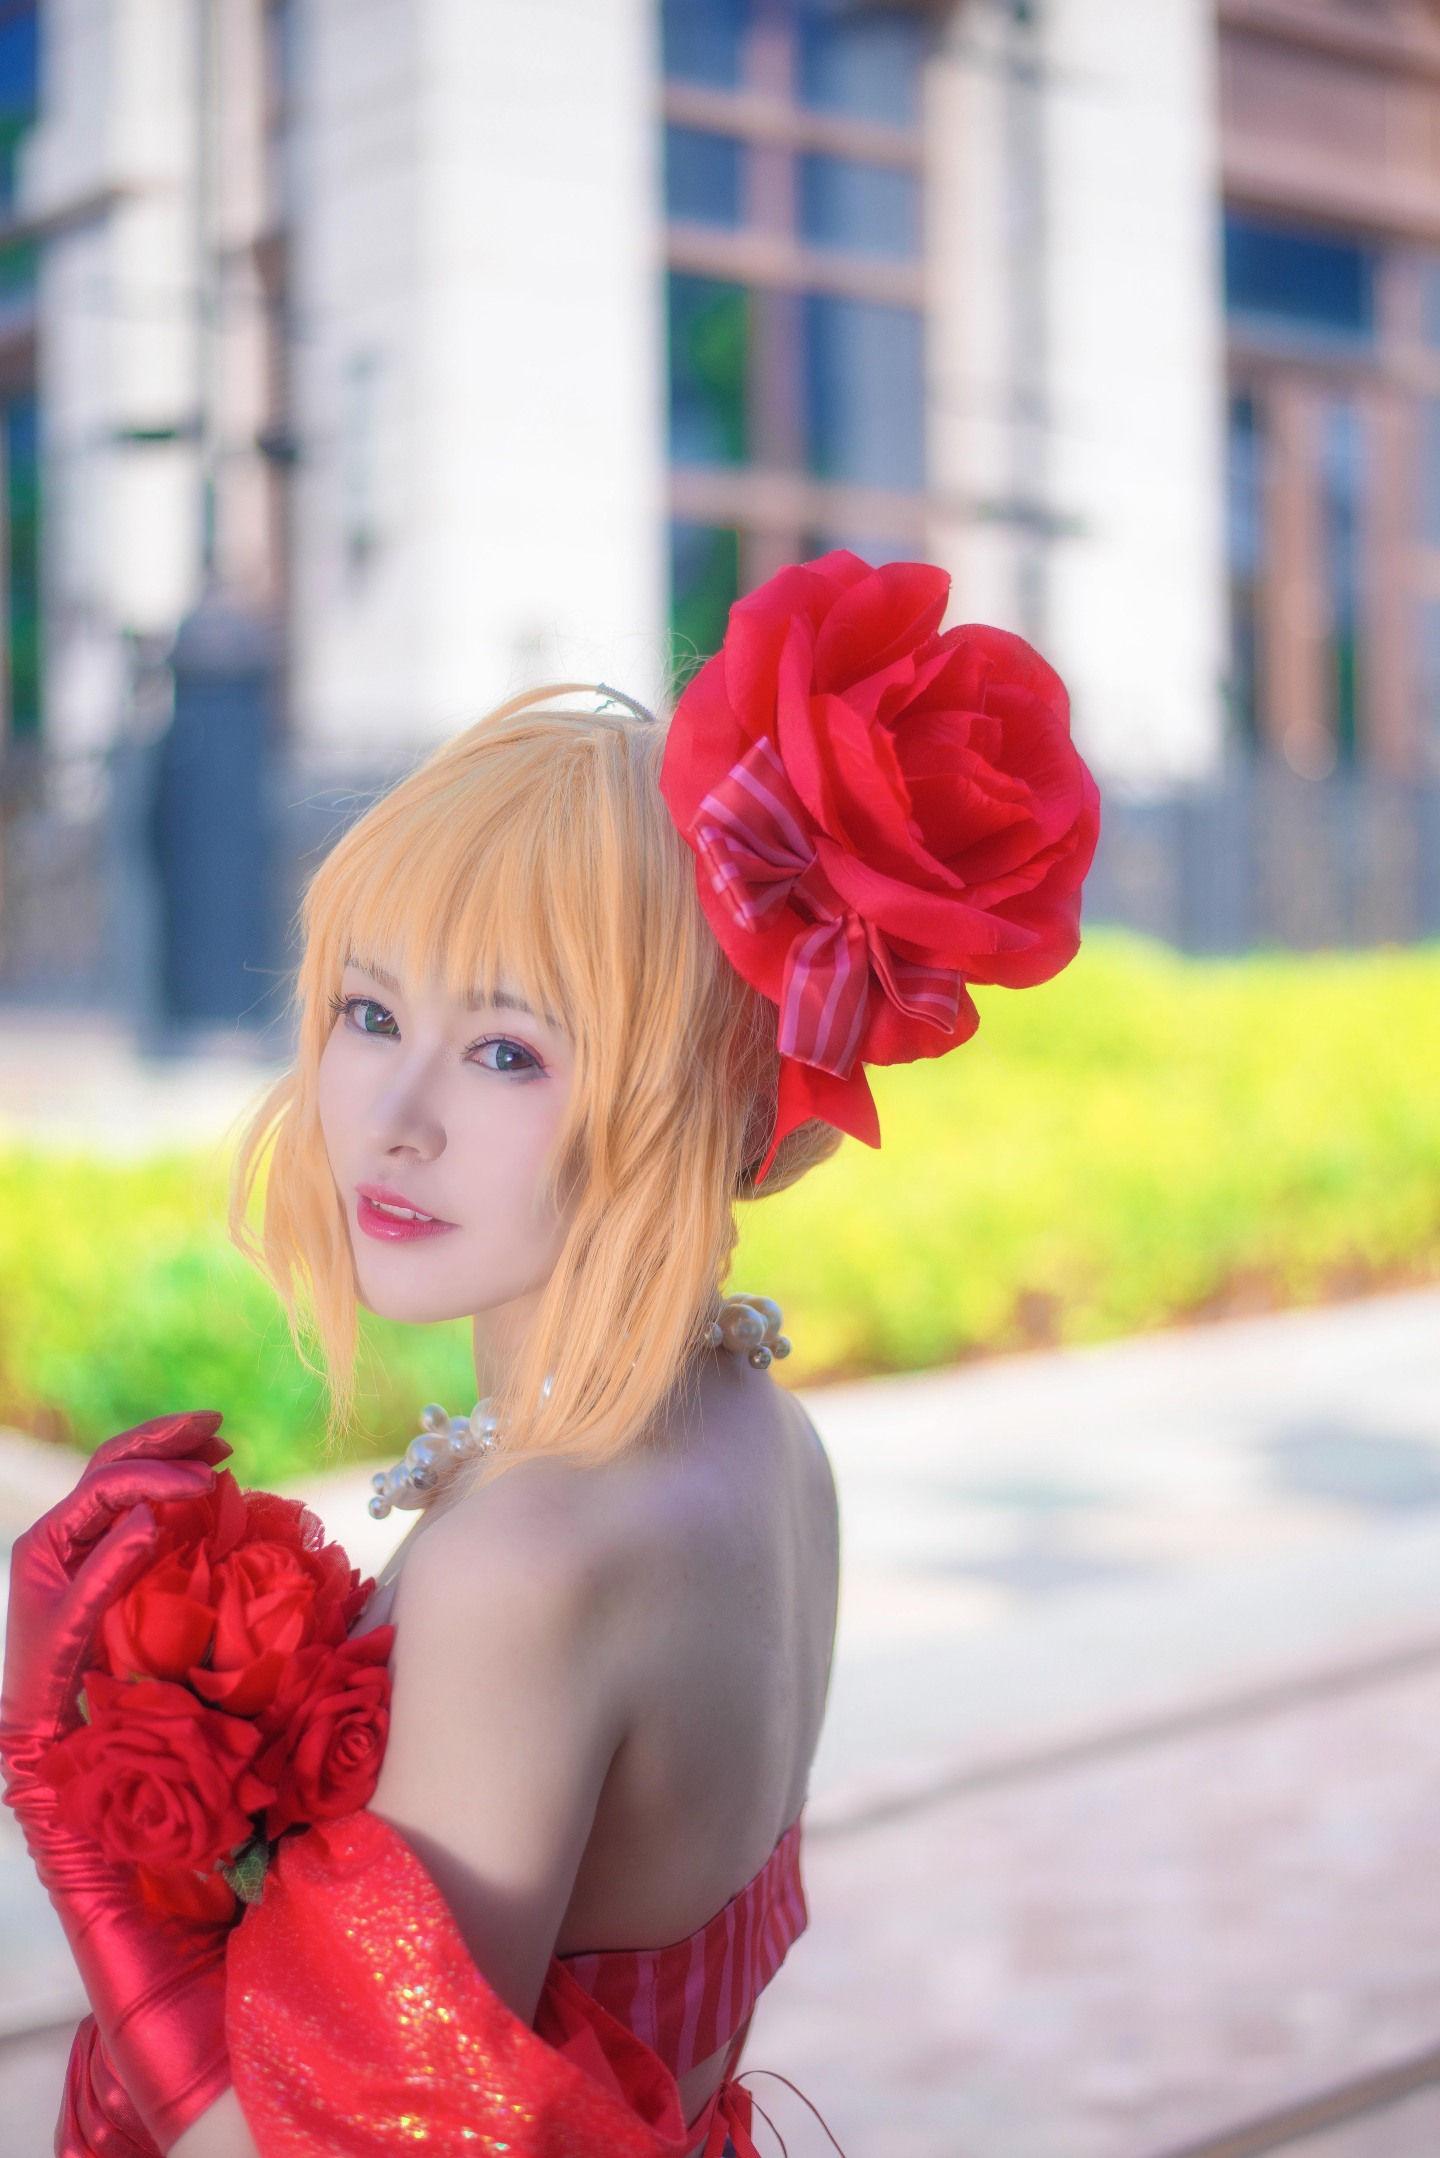 Fate/EXTRA 尼禄偶像皇帝手办ver cosplay插图(2)